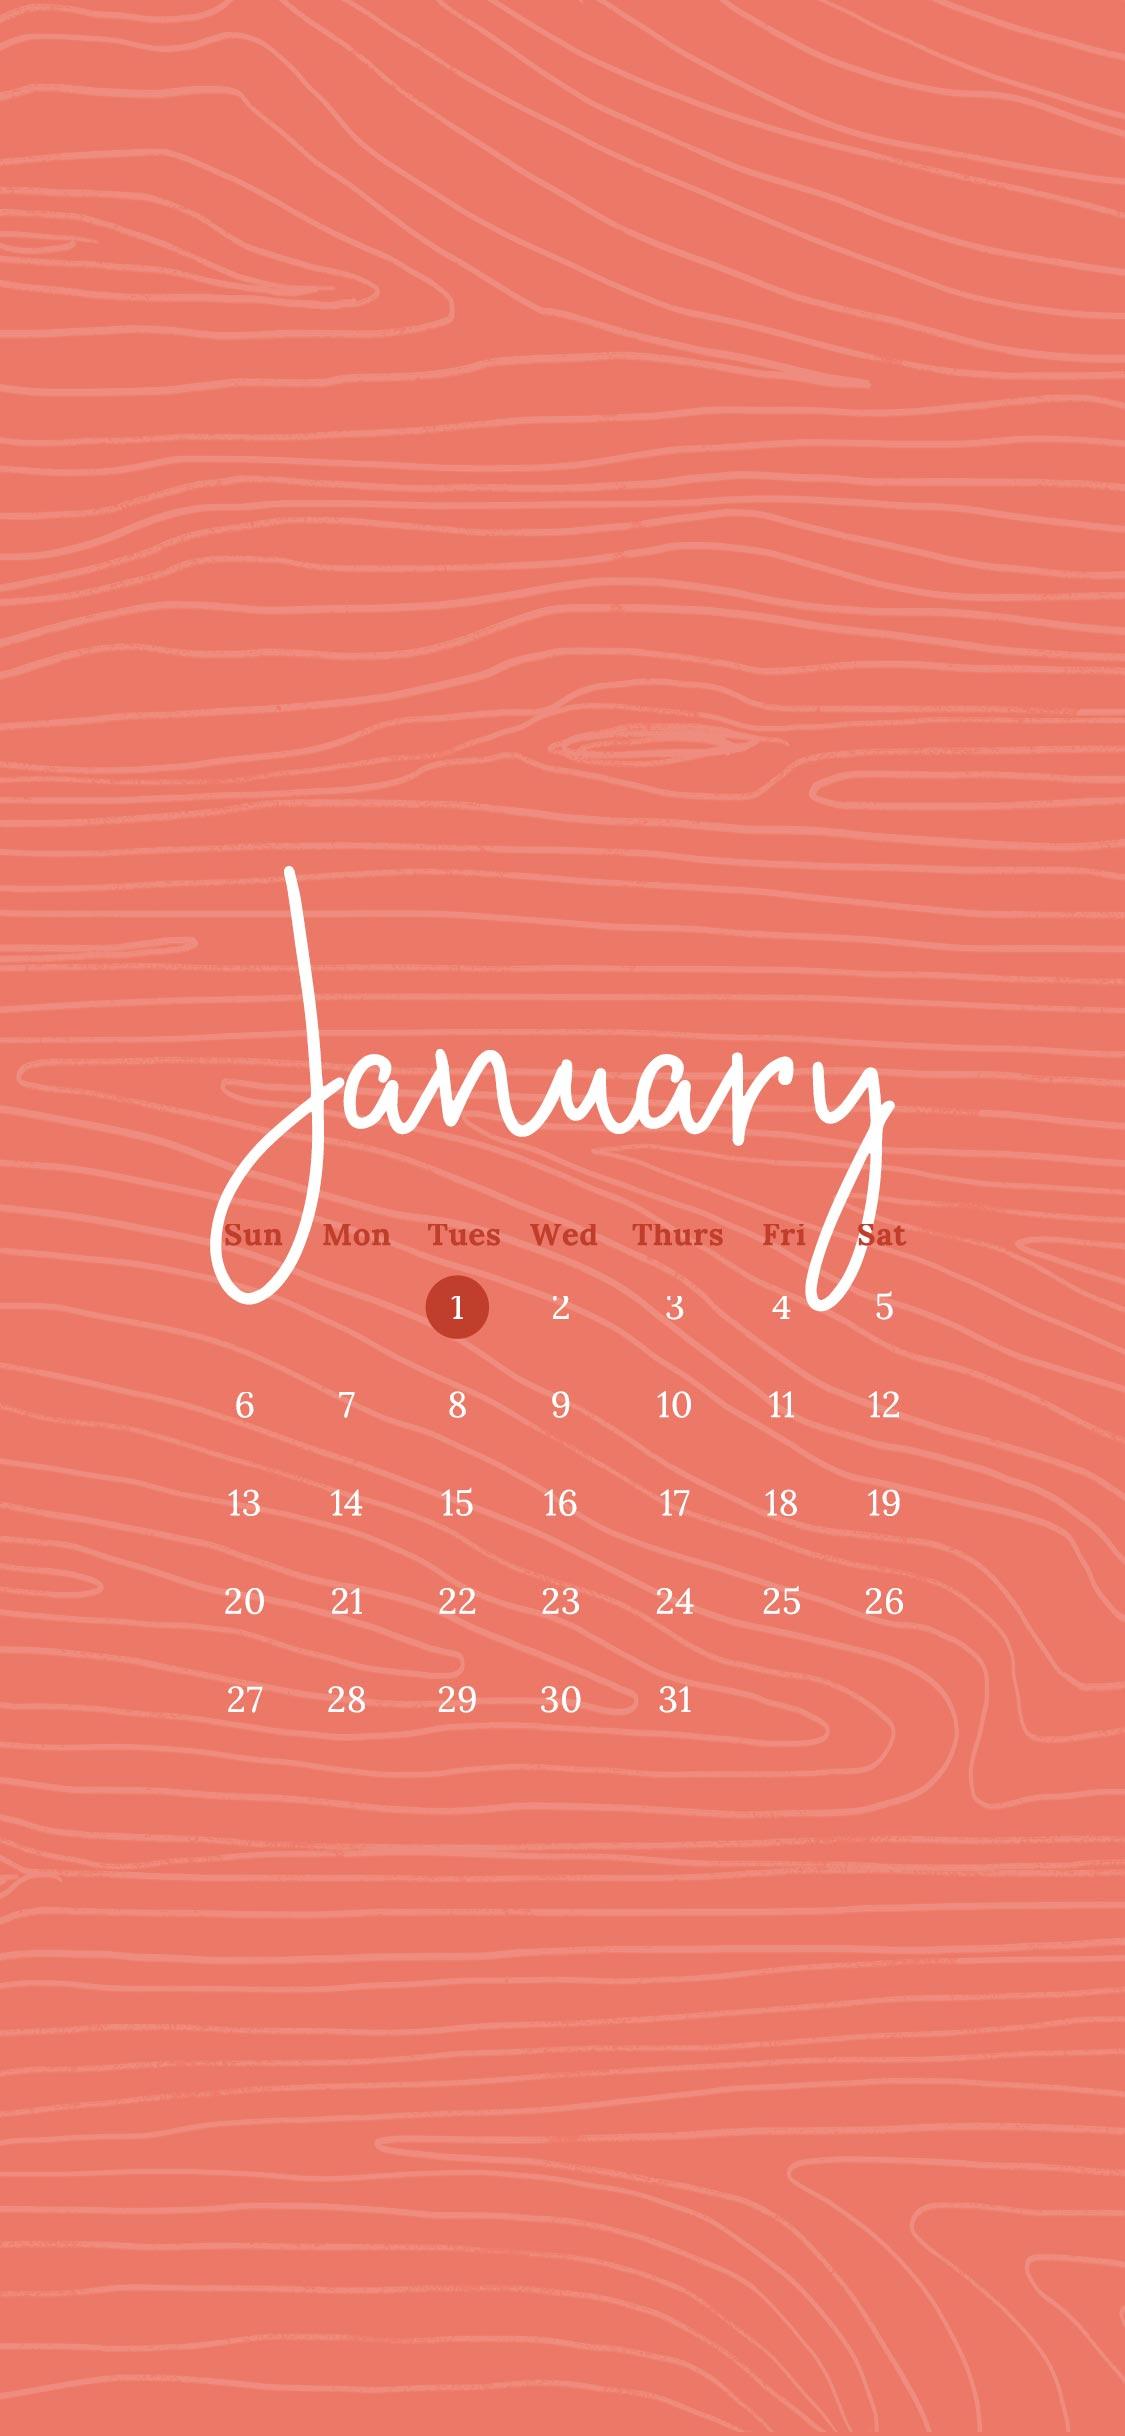 Free Wallpaper For January 2019 Six Leaf Design